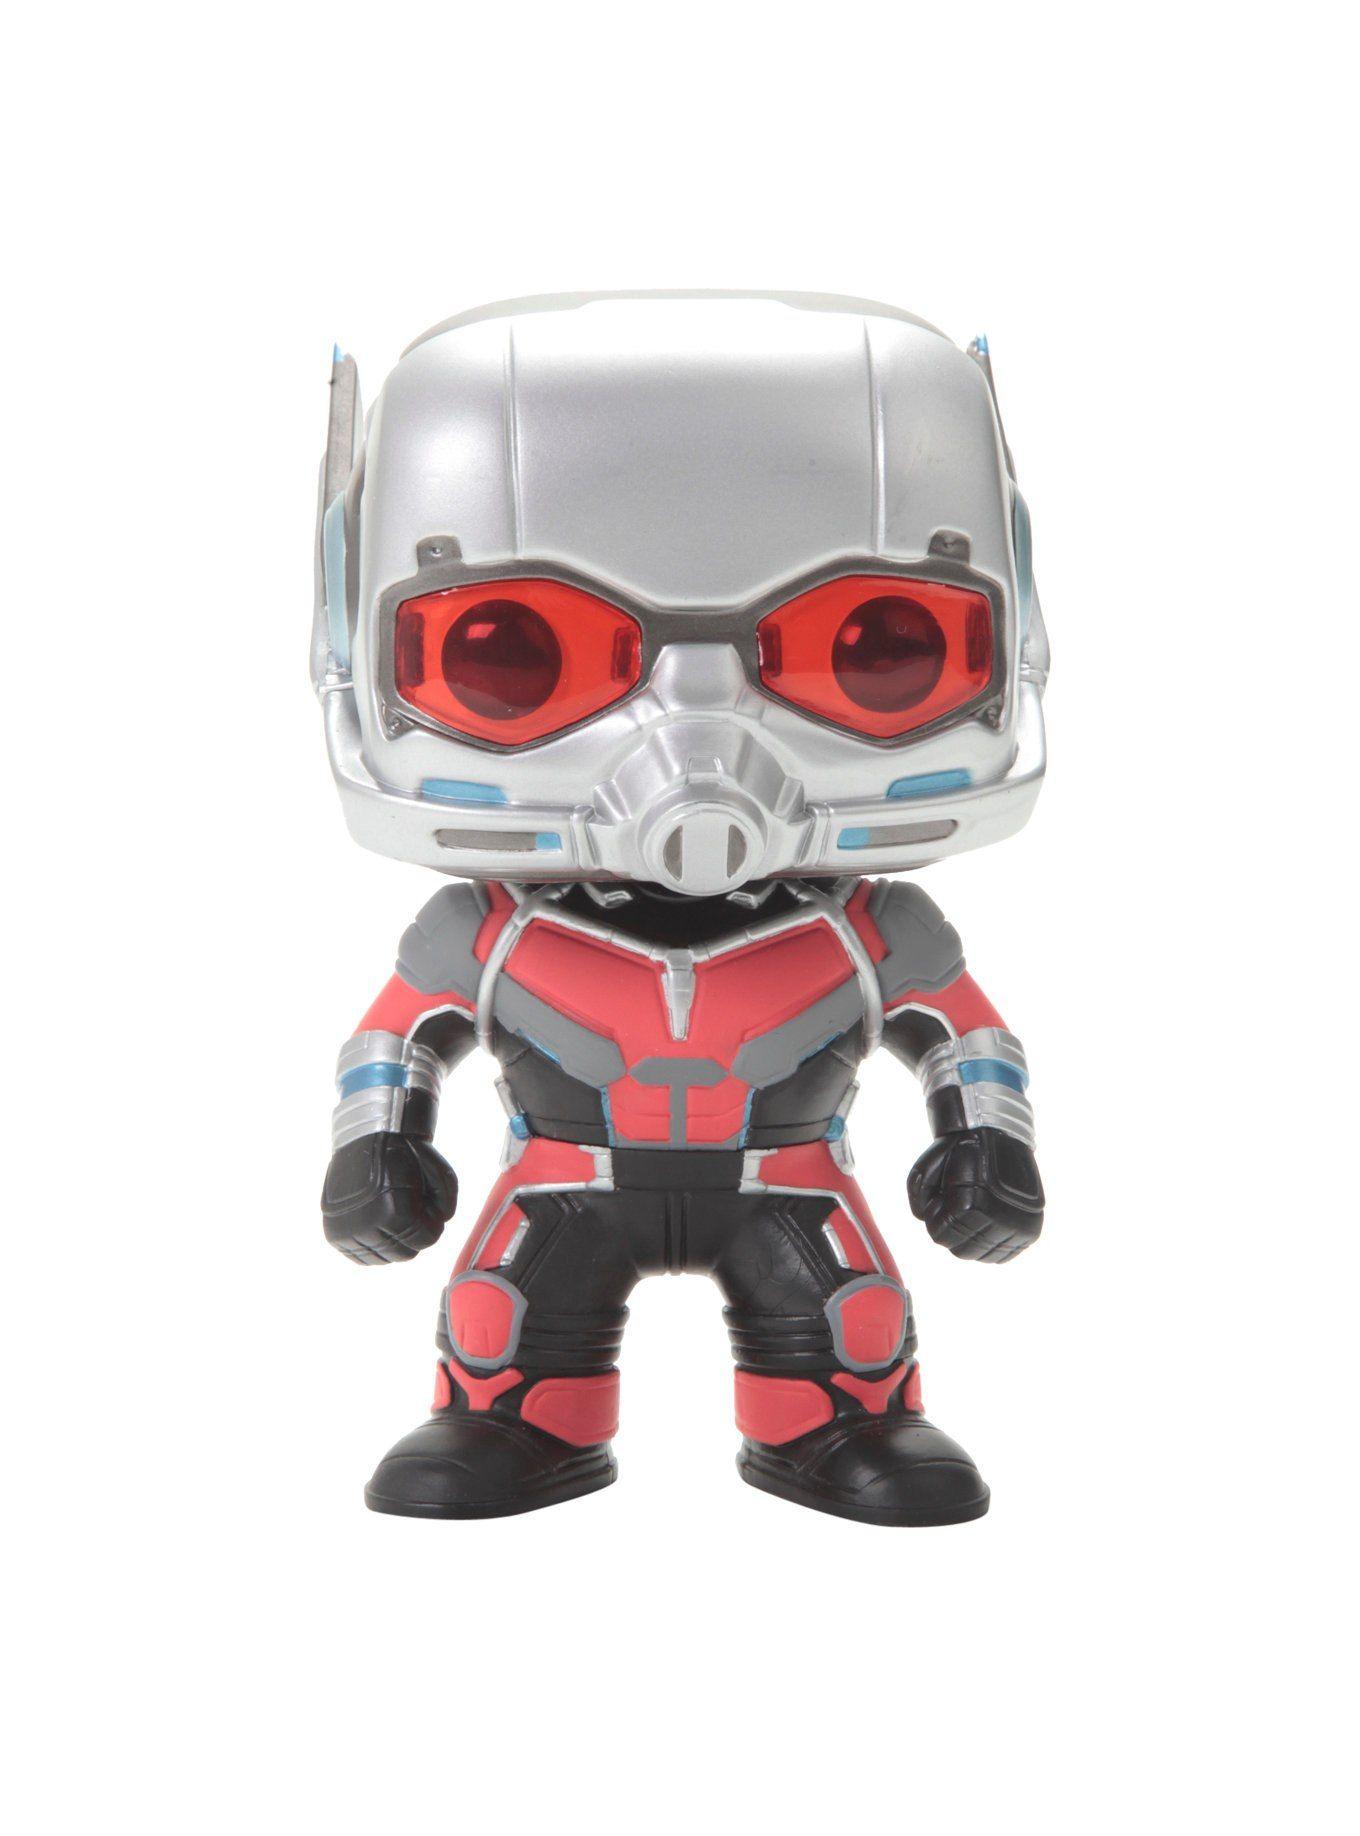 Giat-Man #135 ( Gigante ) - Captain America Civil War ( Capitão América Guerra Civil ) - Funko Pop! Marvel